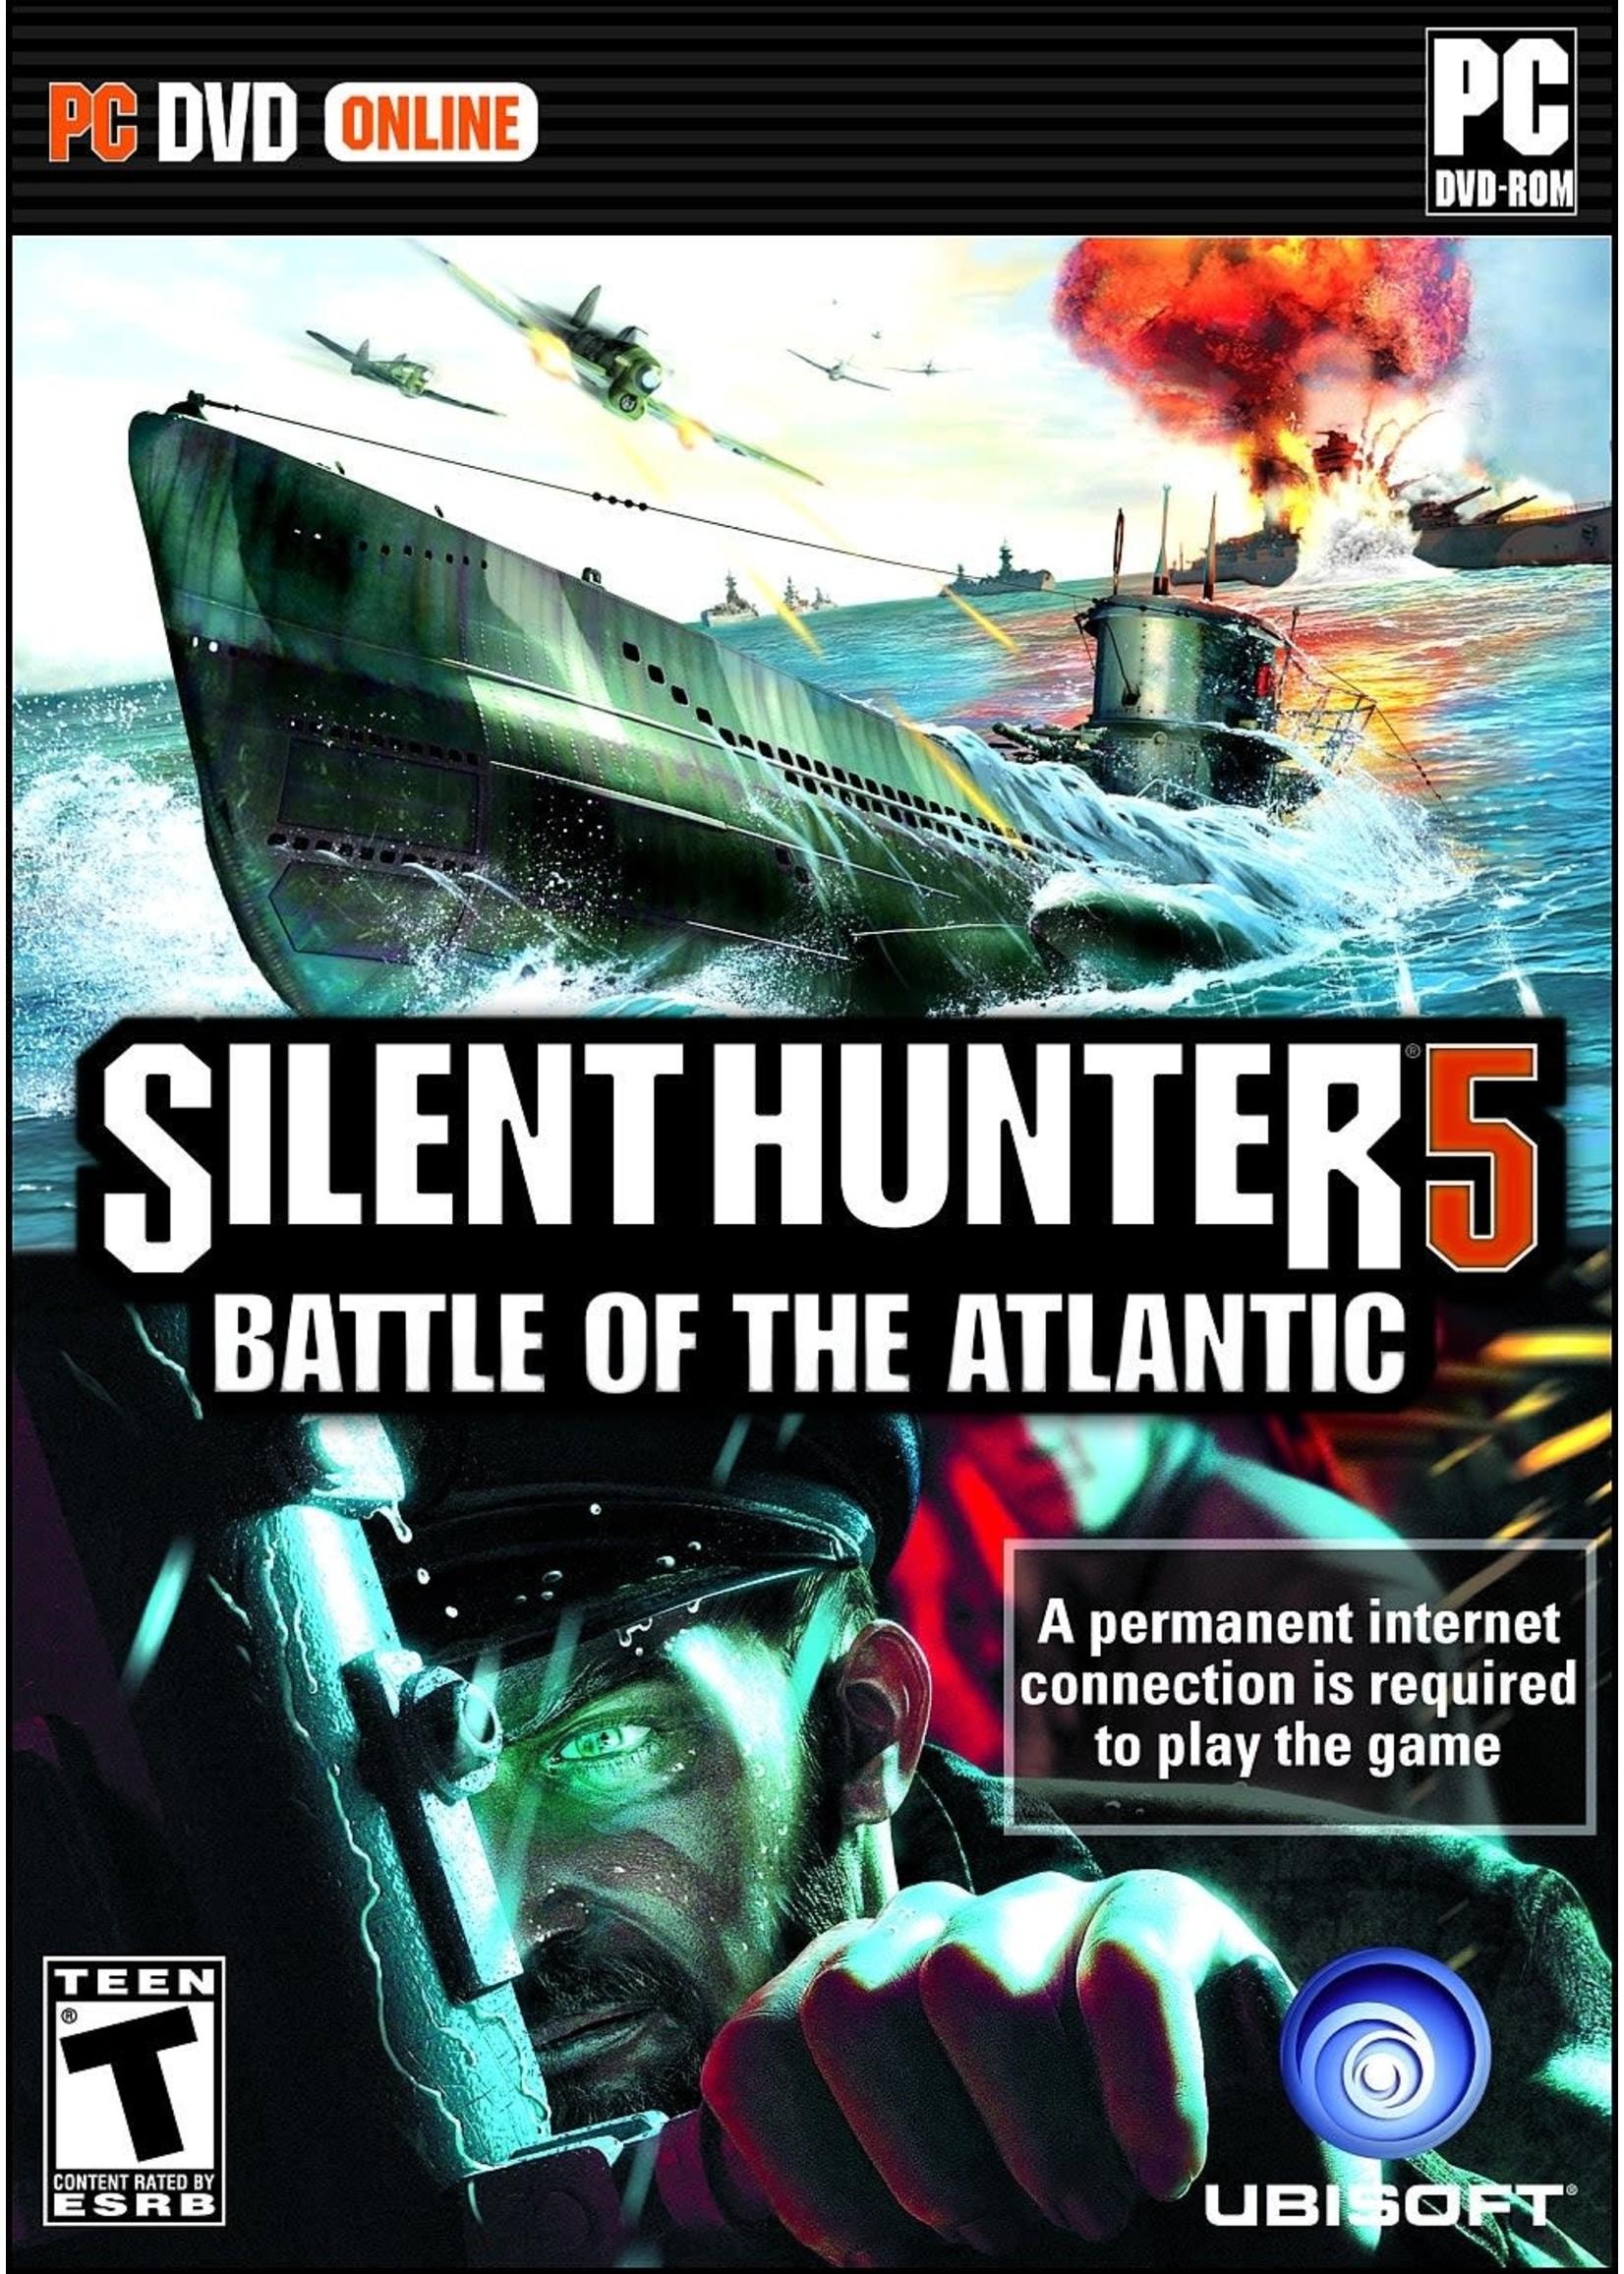 Silent Hunter 5: Battle of the Atlantic PC Games